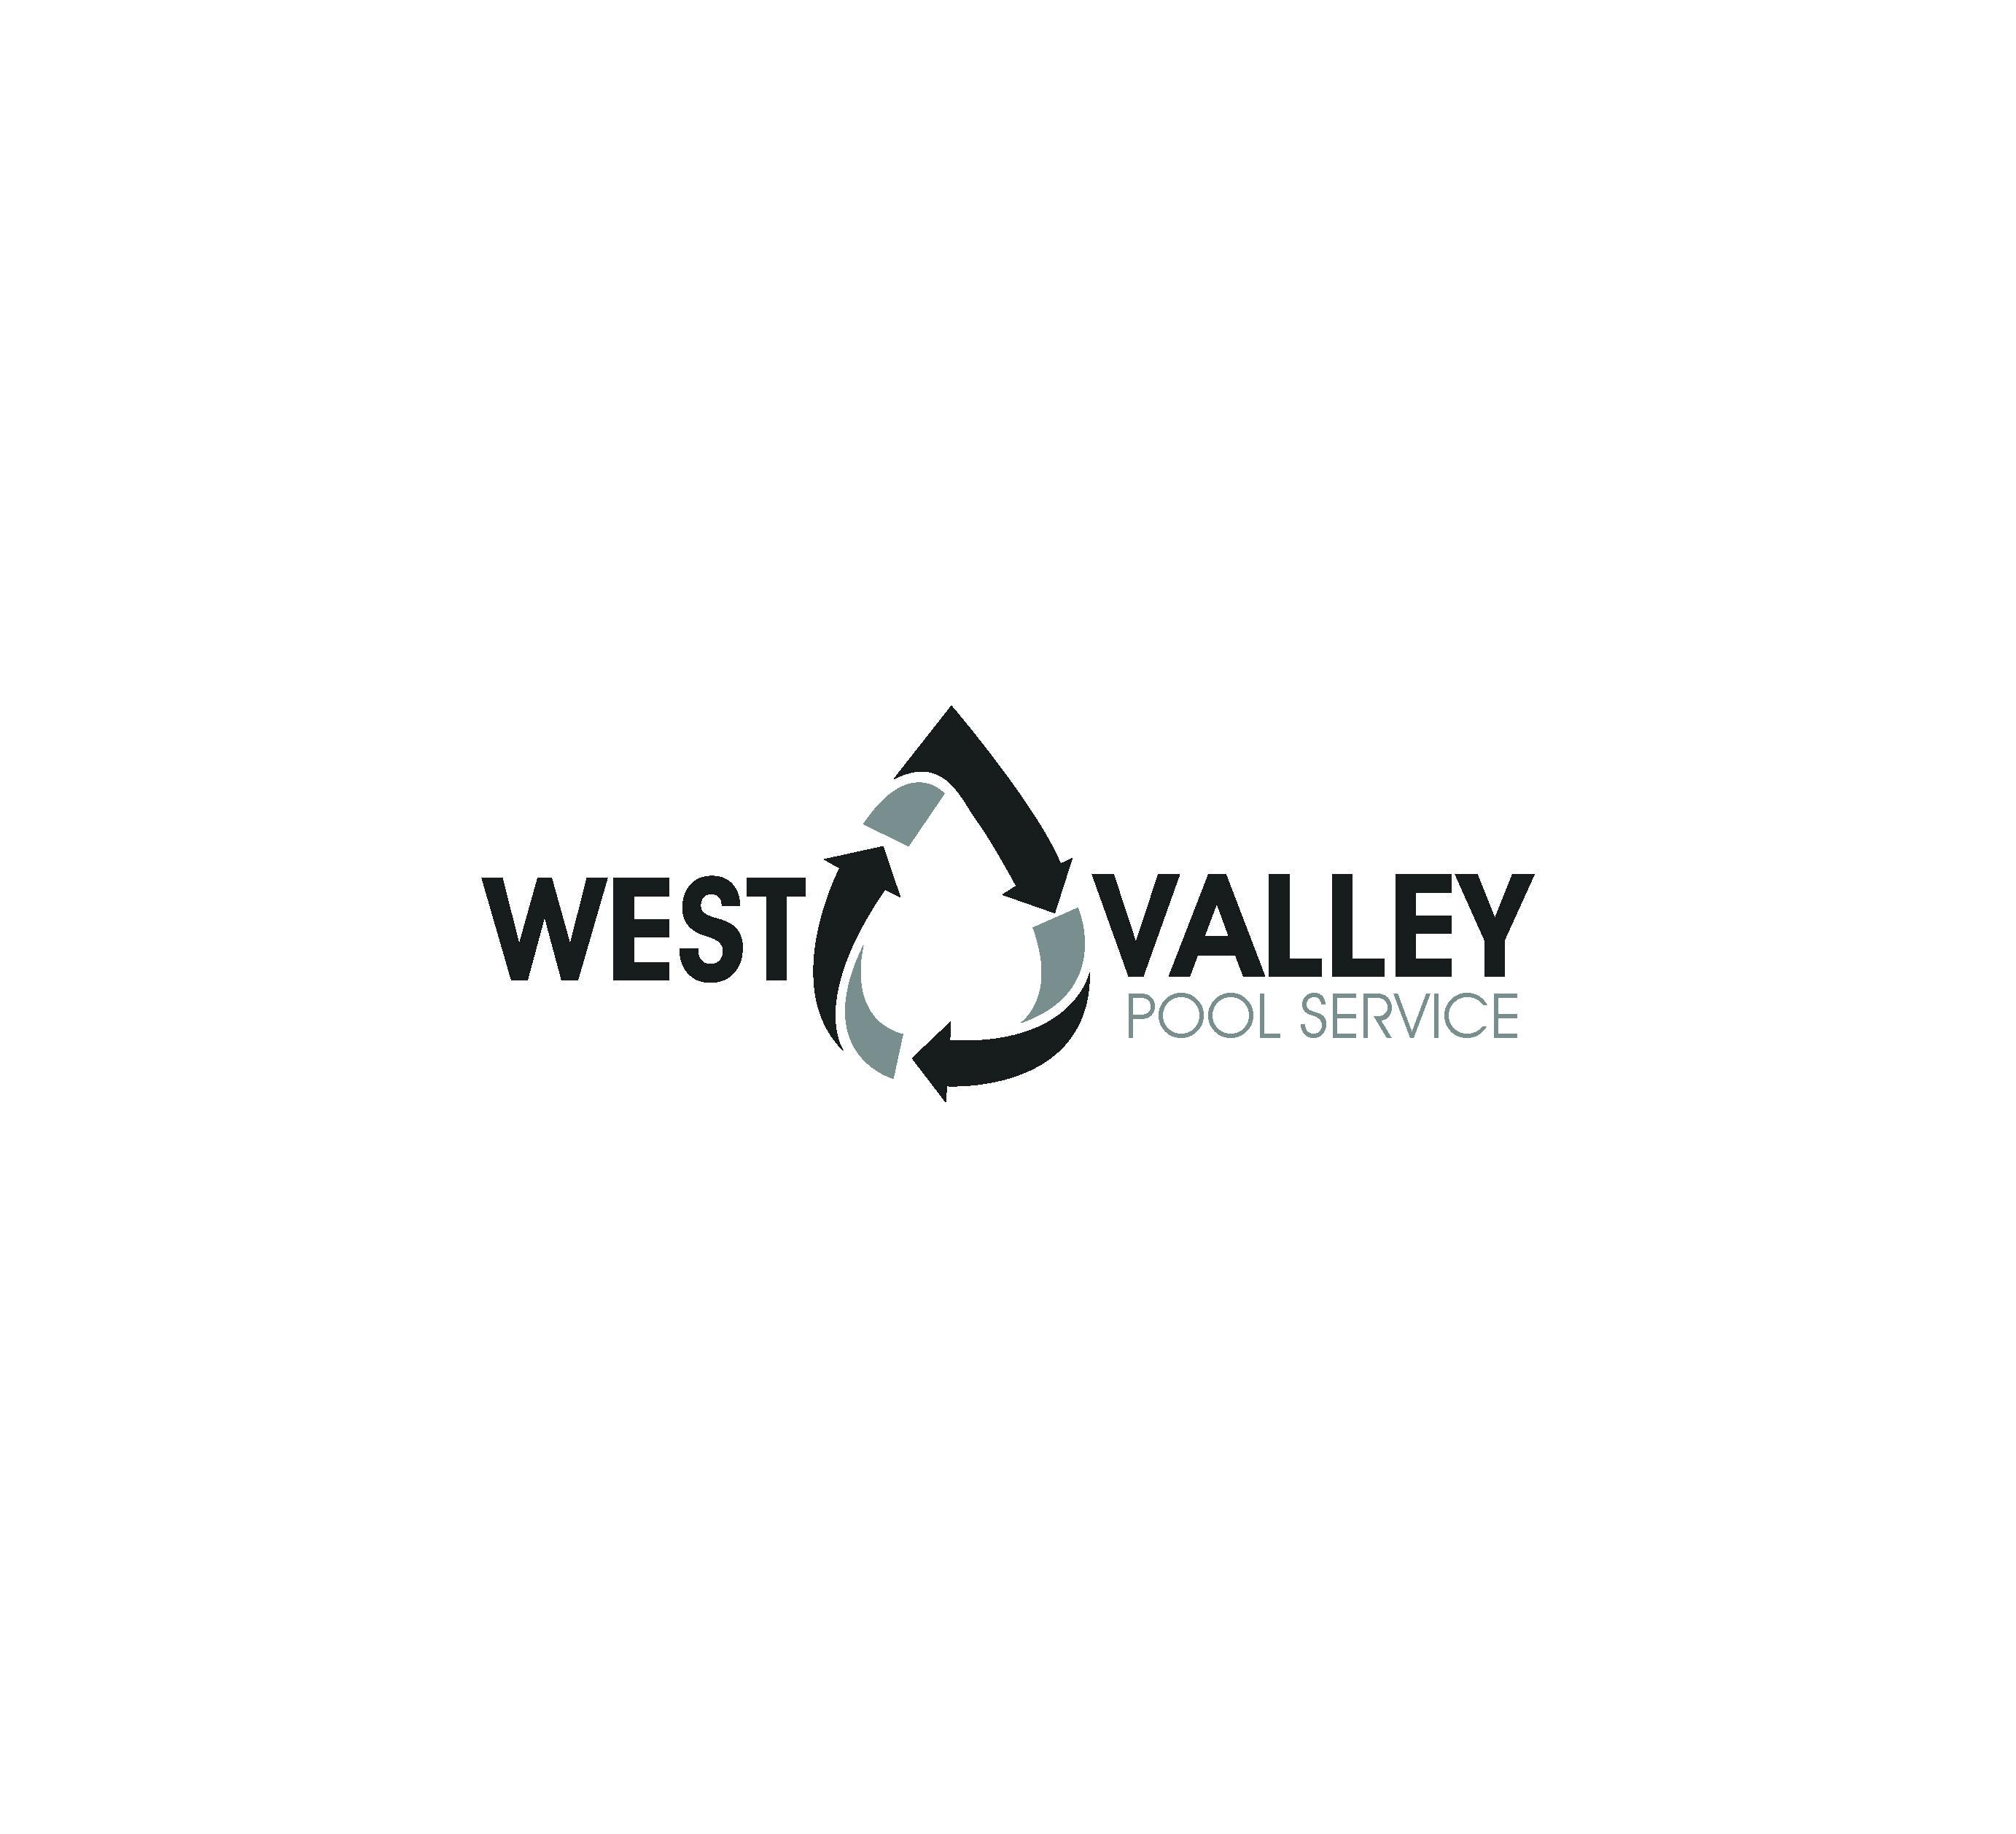 Logo Design by Sampath Gunathilaka - Entry No. 15 in the Logo Design Contest Clever Logo Design for West Valley Pool Service.